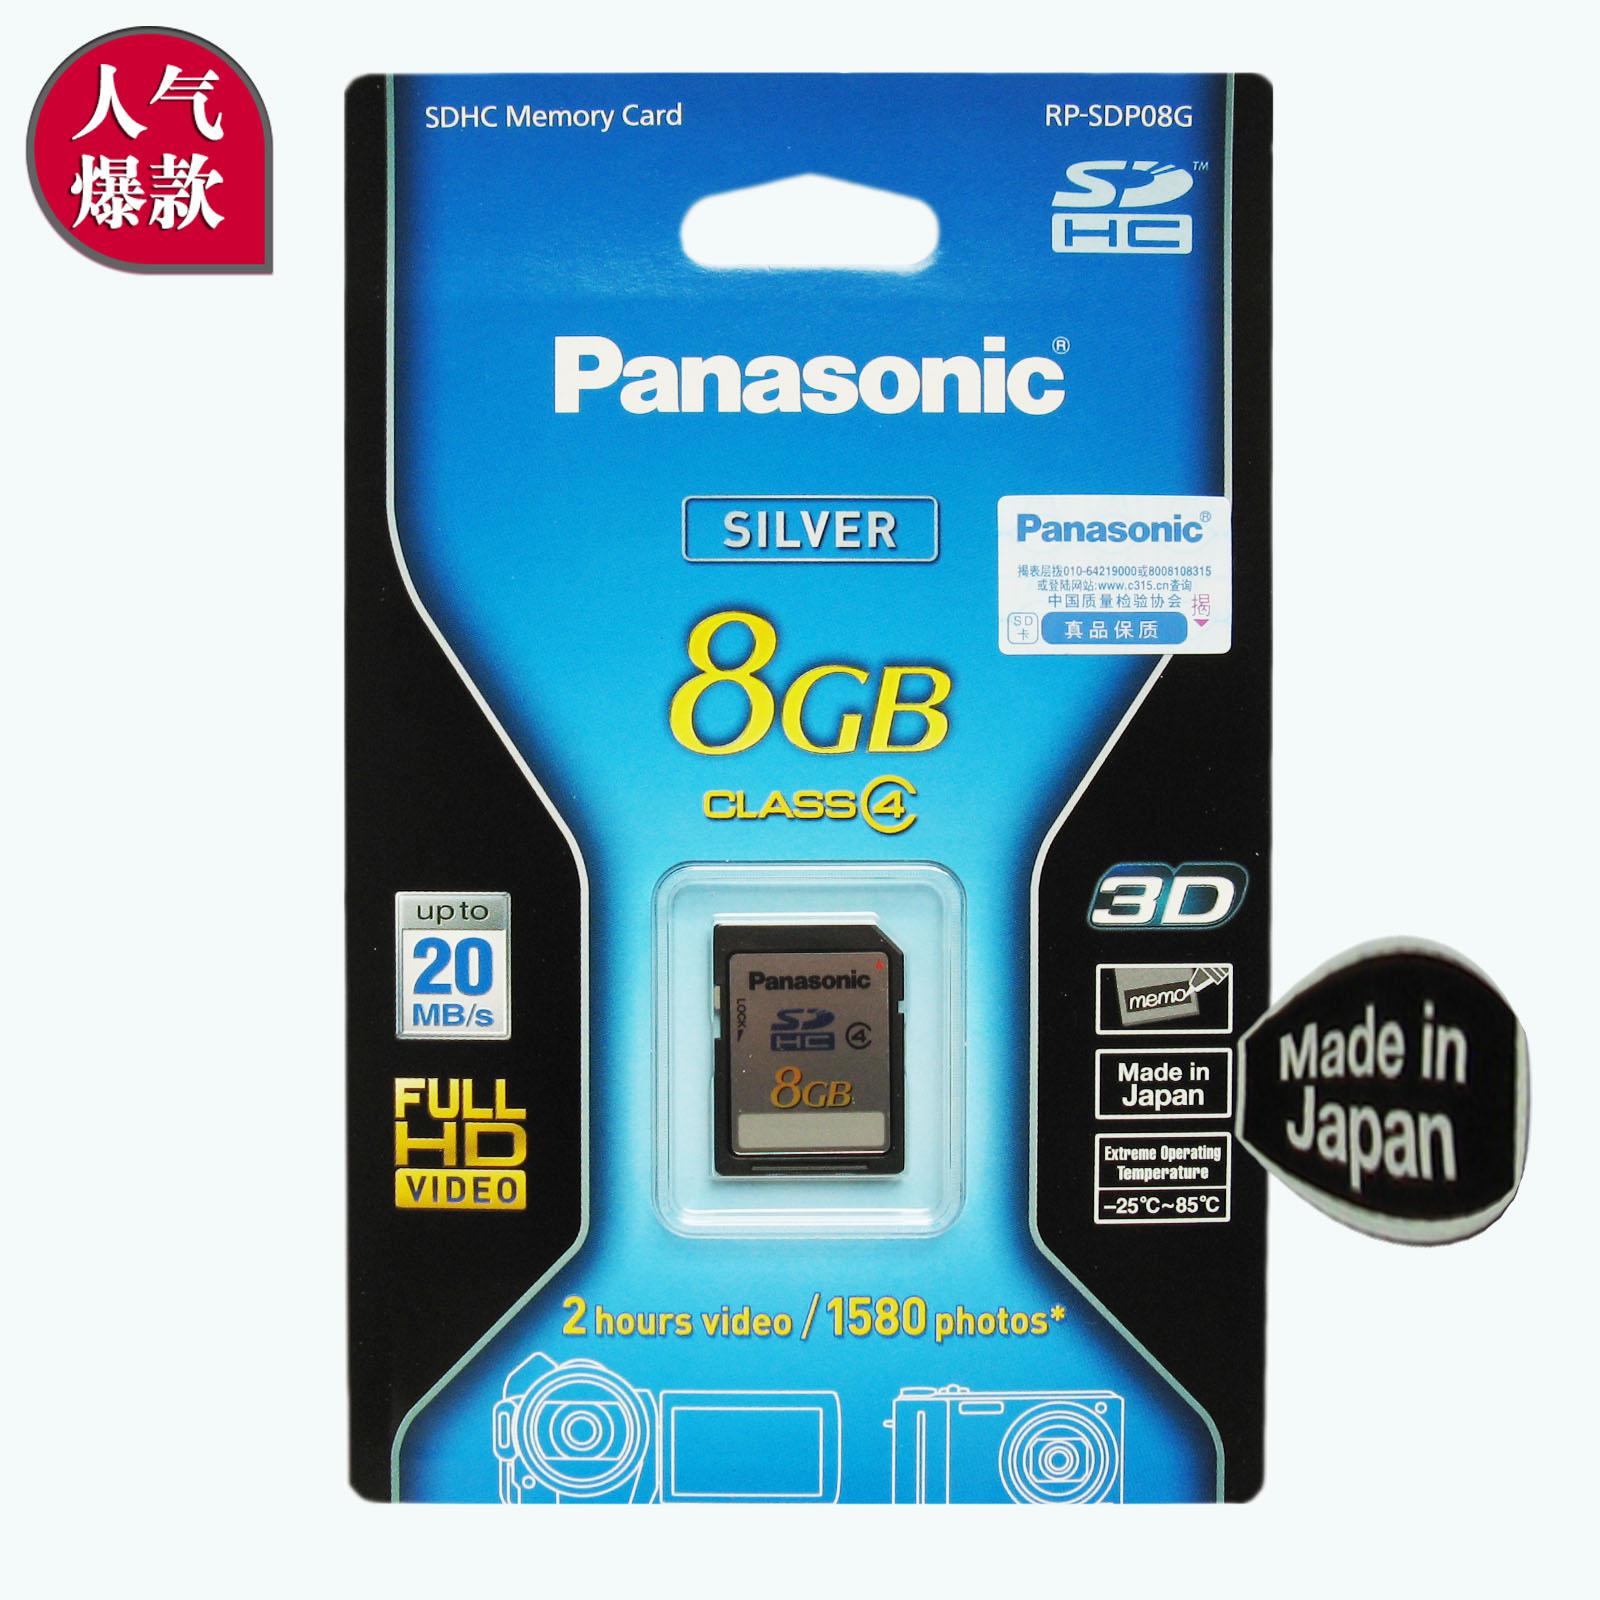 NEW 8Gb Genuine Patriot Memory Card for PANASONIC SDR-S7S DIGITAL CAMCORDER